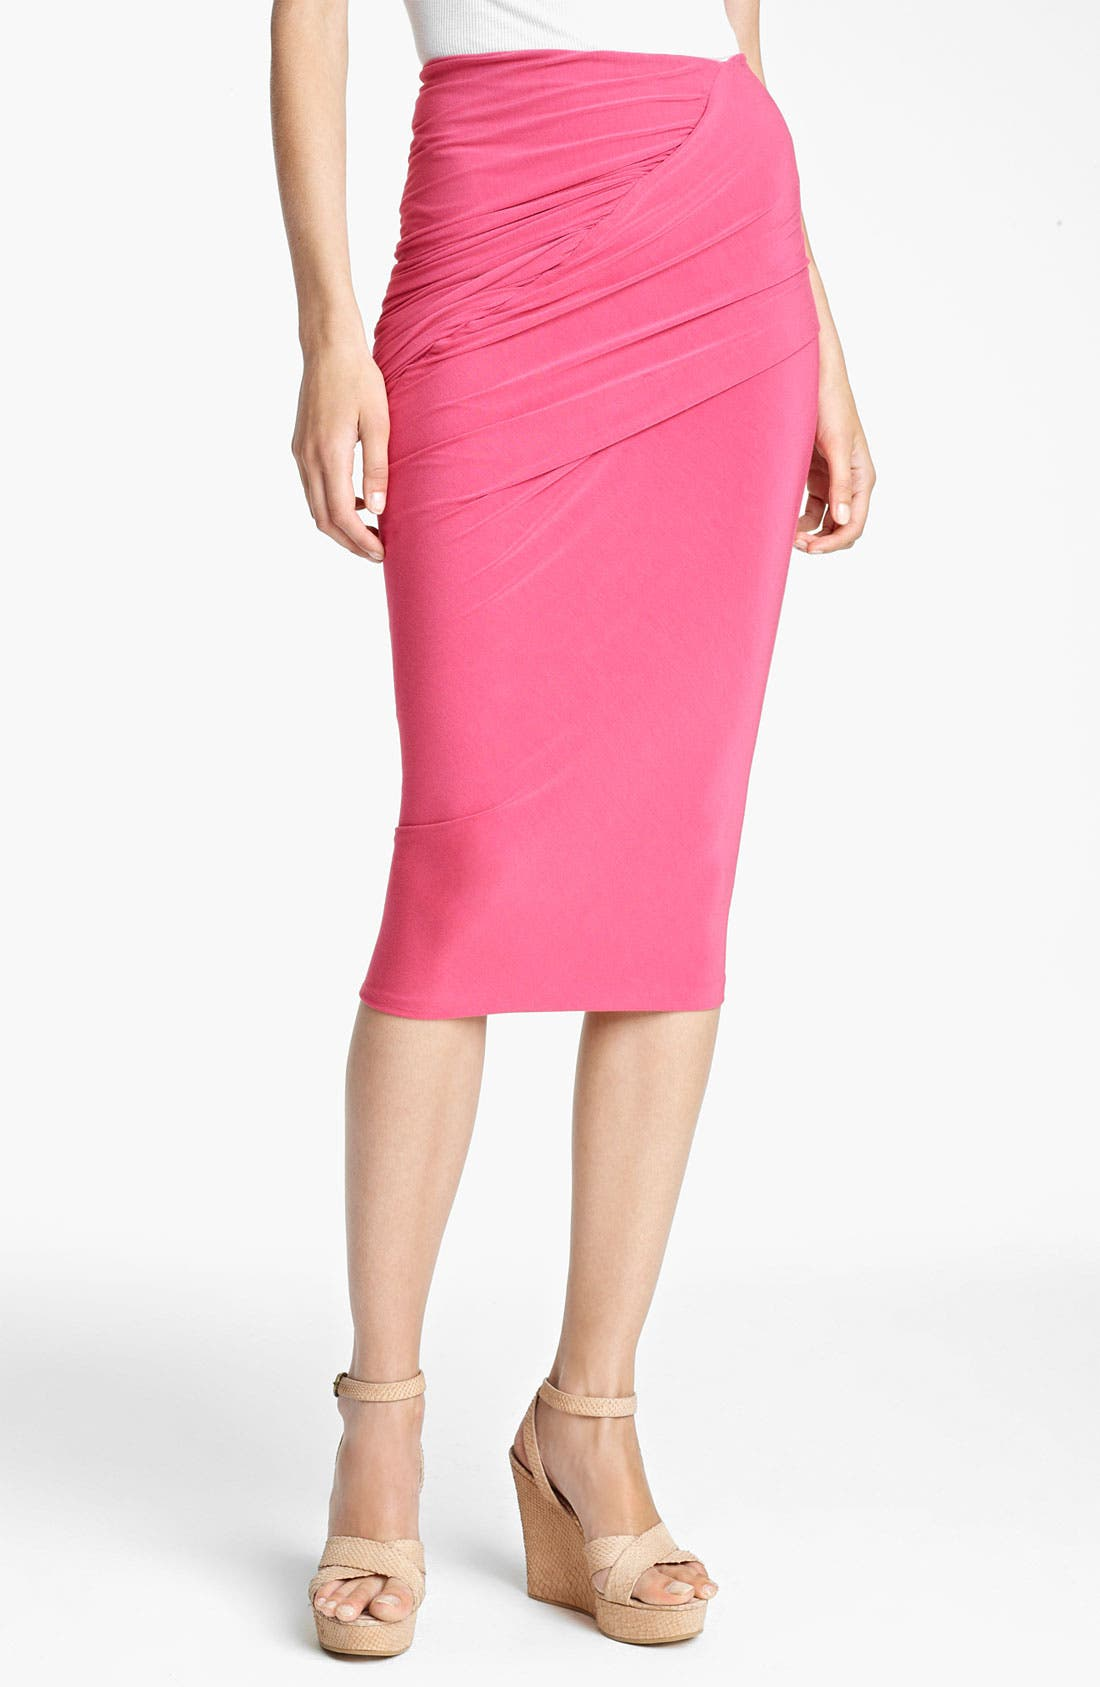 Alternate Image 1 Selected - Donna Karan Collection Draped Jersey Skirt